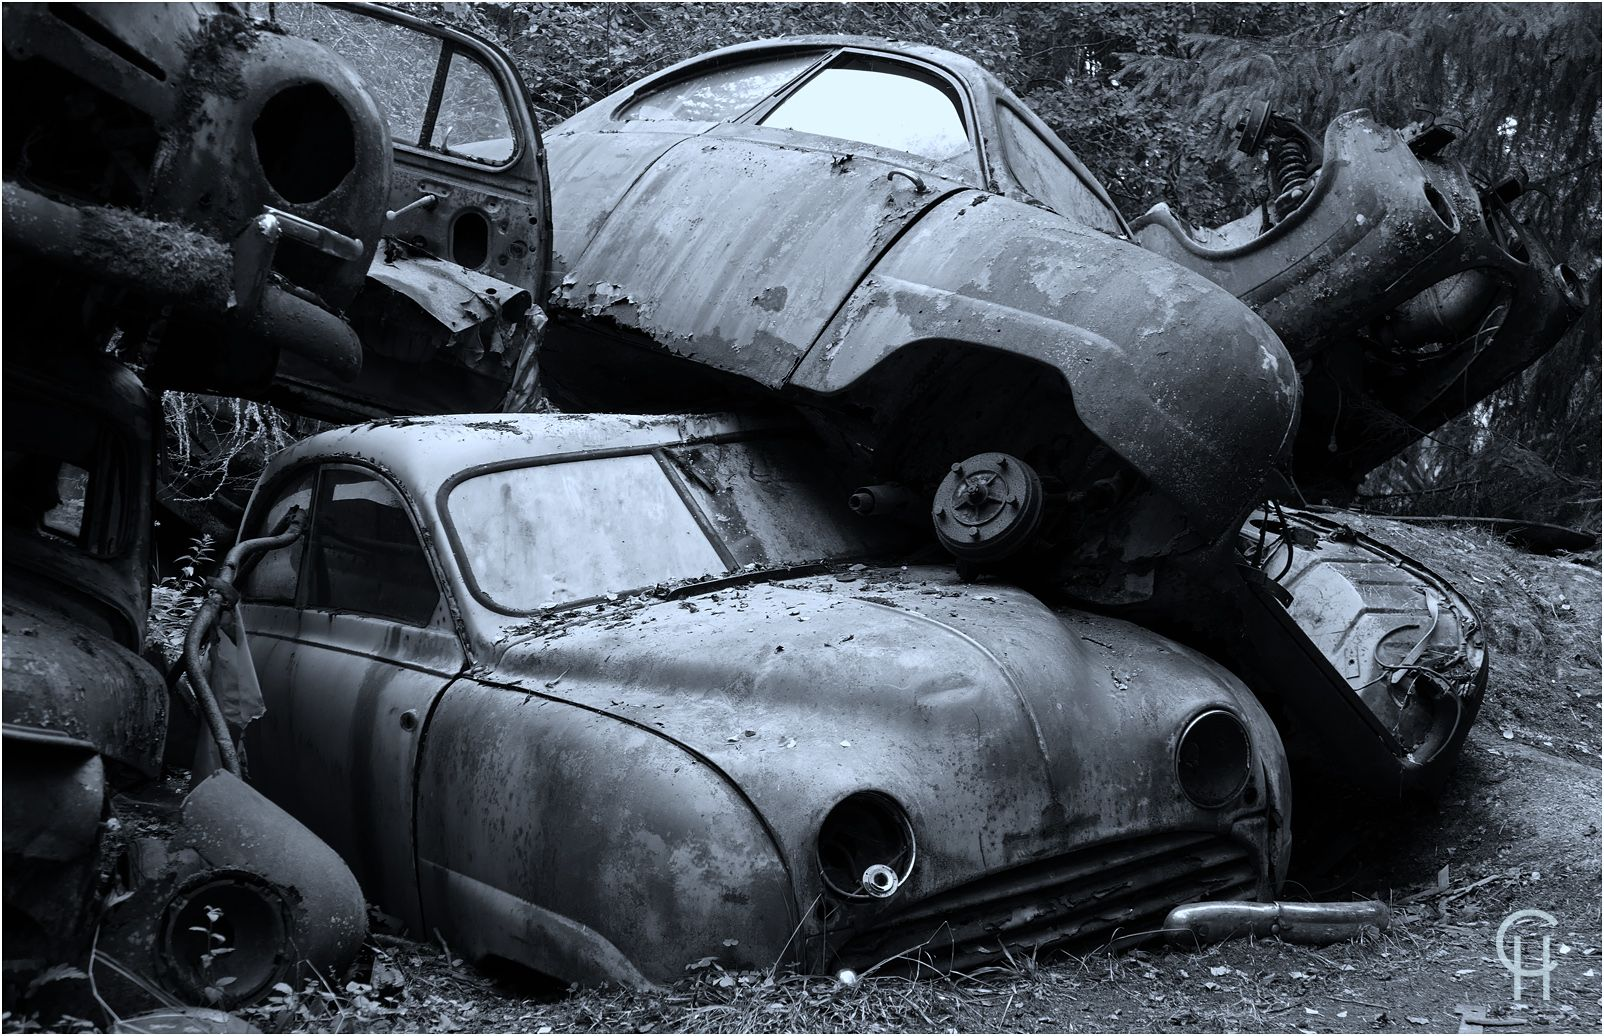 Bastnas Bastnas Ivansson Autofriedhof Schrottplatz Junk Yard Scrapyard Vintage Car Saab 92 93 95 96 Mystic Magical Places Magische Orte Oldtimer Autos Friedhof